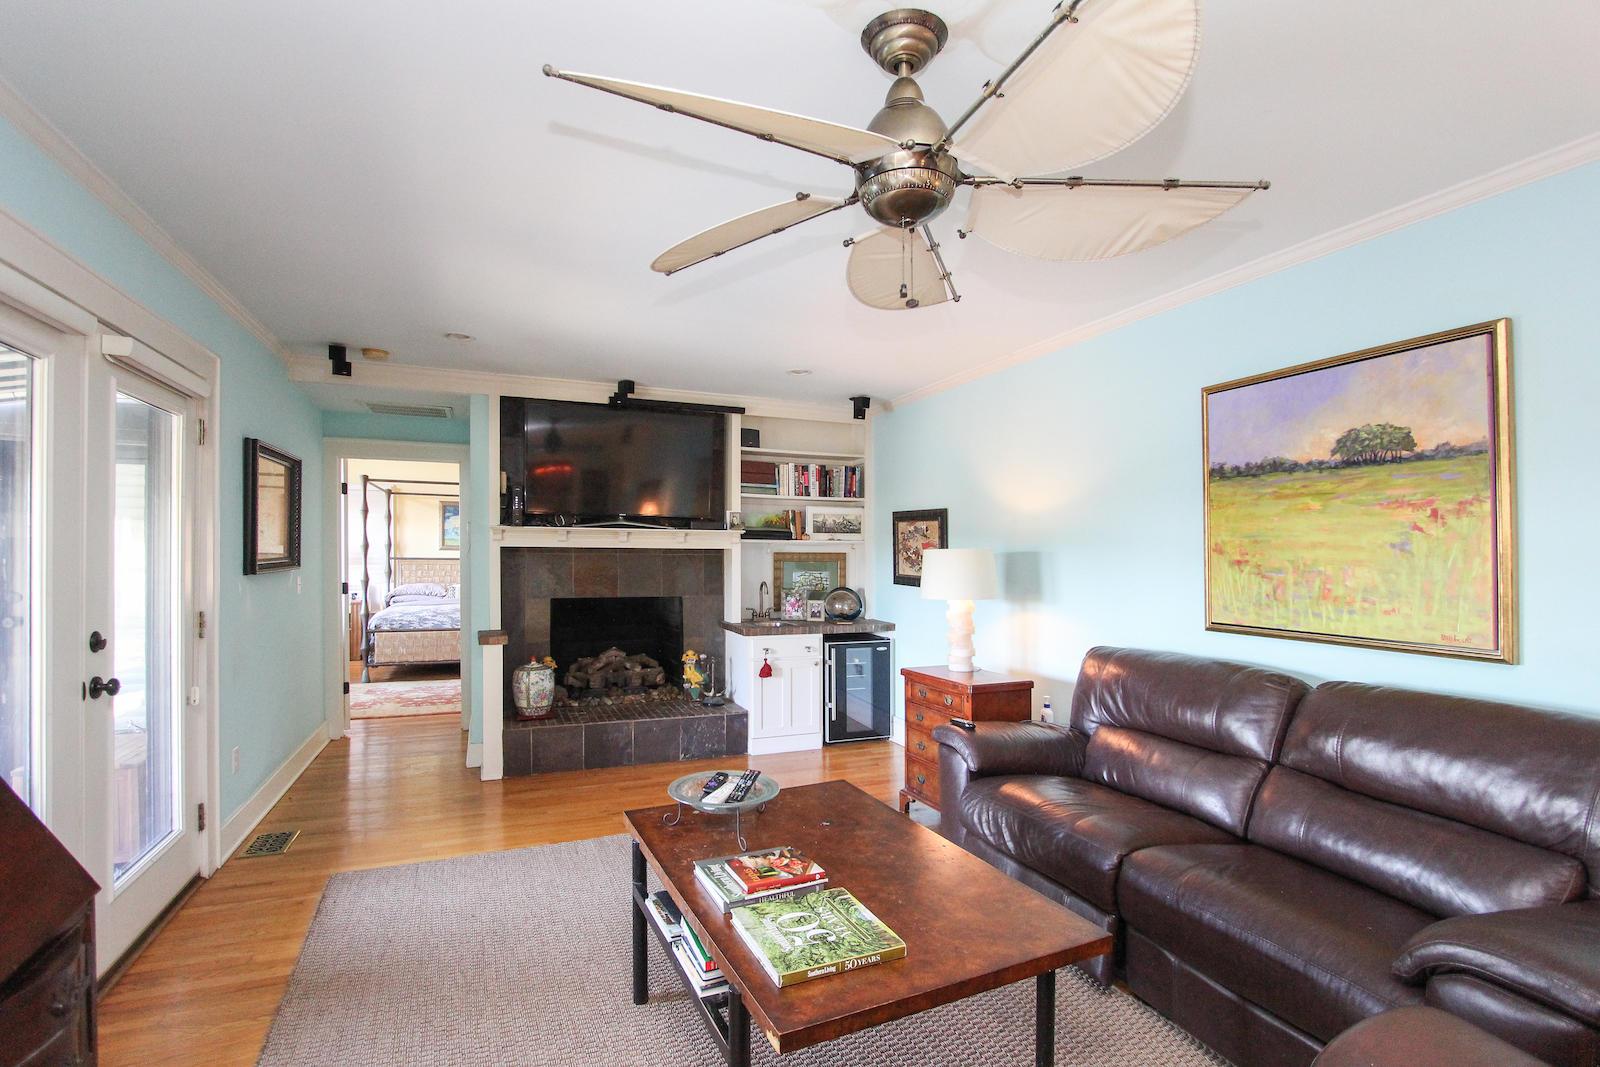 Albemarle Point Homes For Sale - 3 Albemarle, Charleston, SC - 8